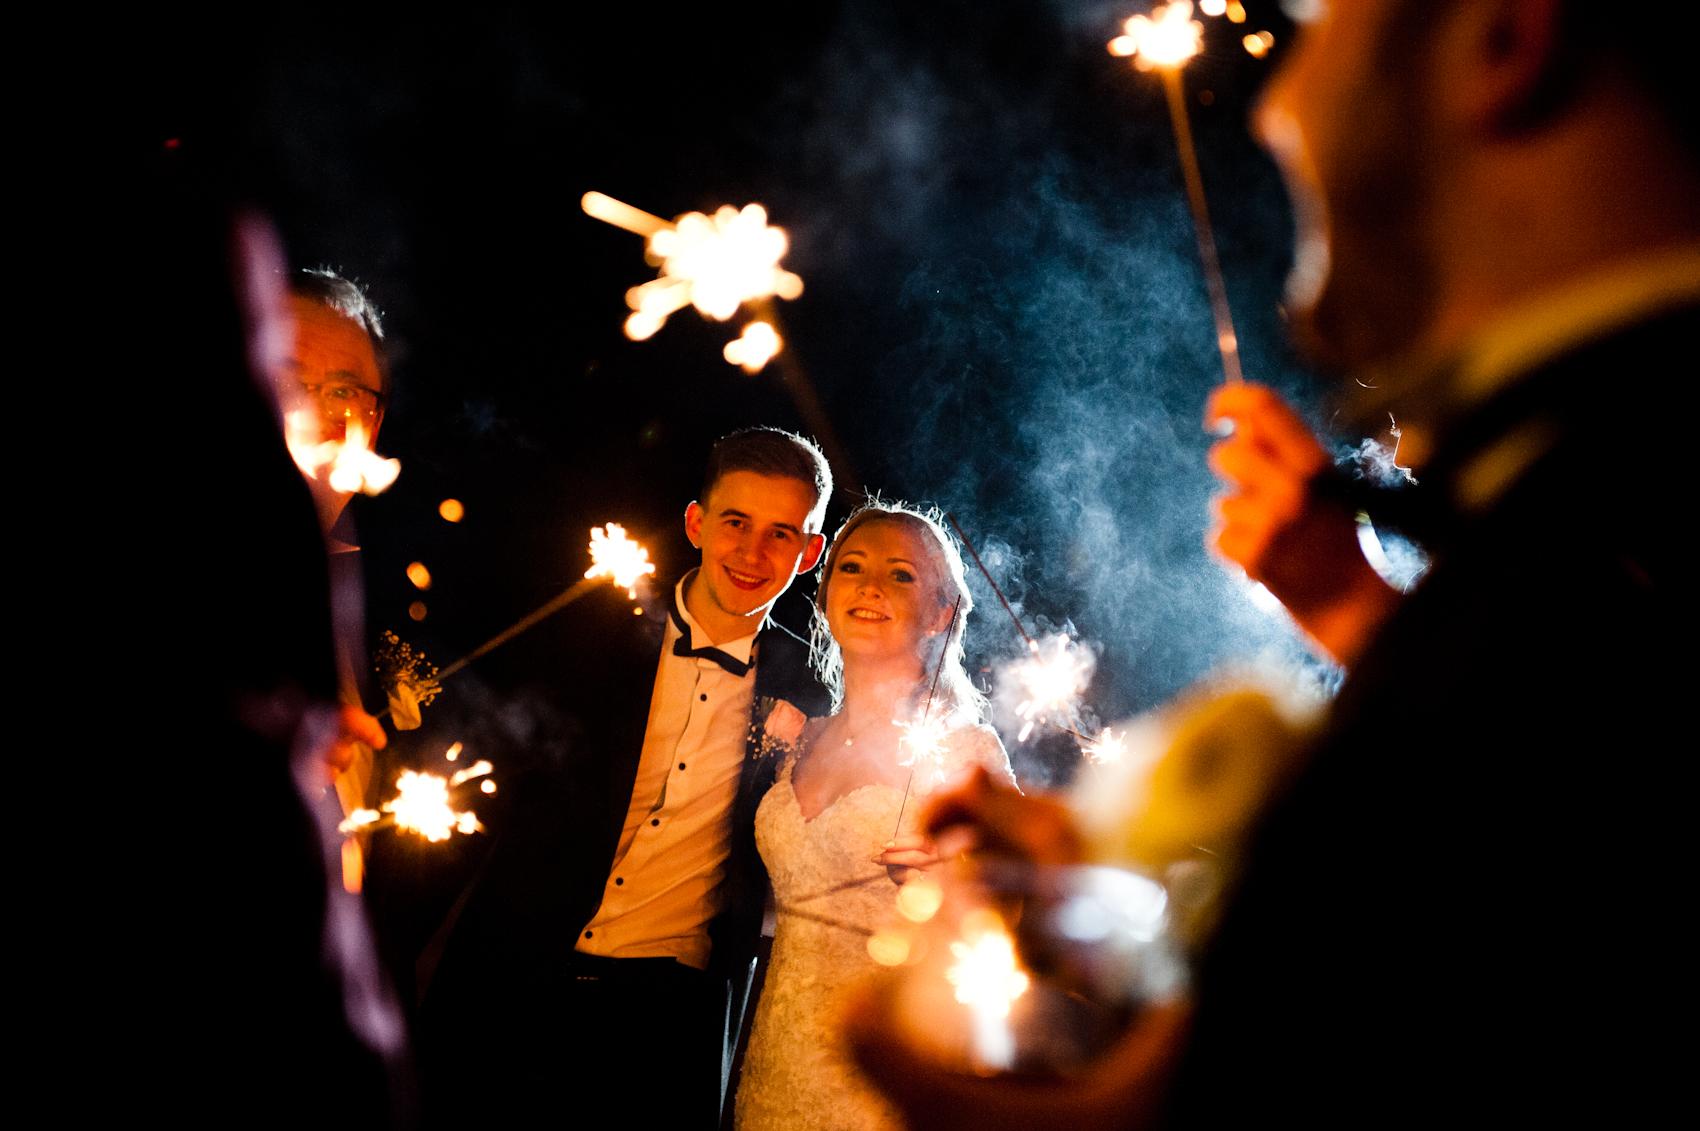 Declan & Emma wedding (24 of 29).jpg